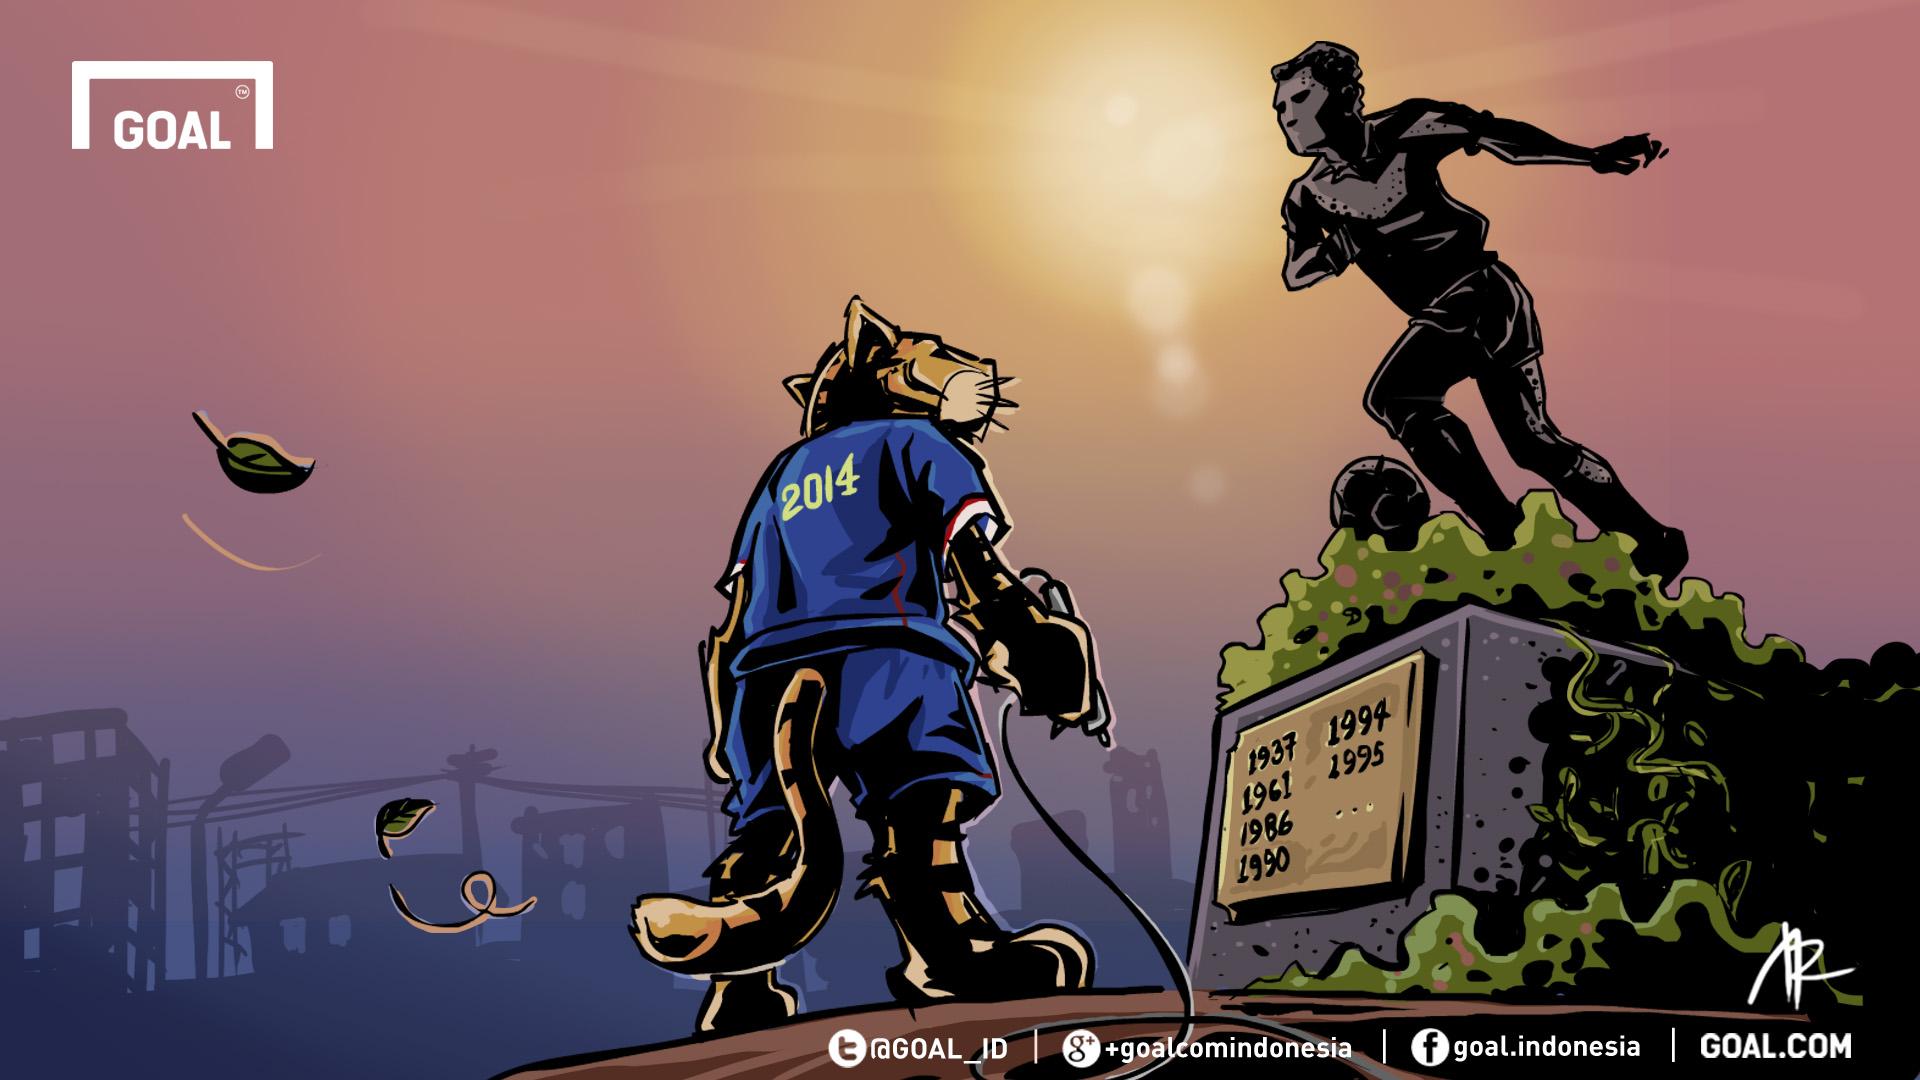 caricature - Persib, 19 tahun kemudian - Goal.com